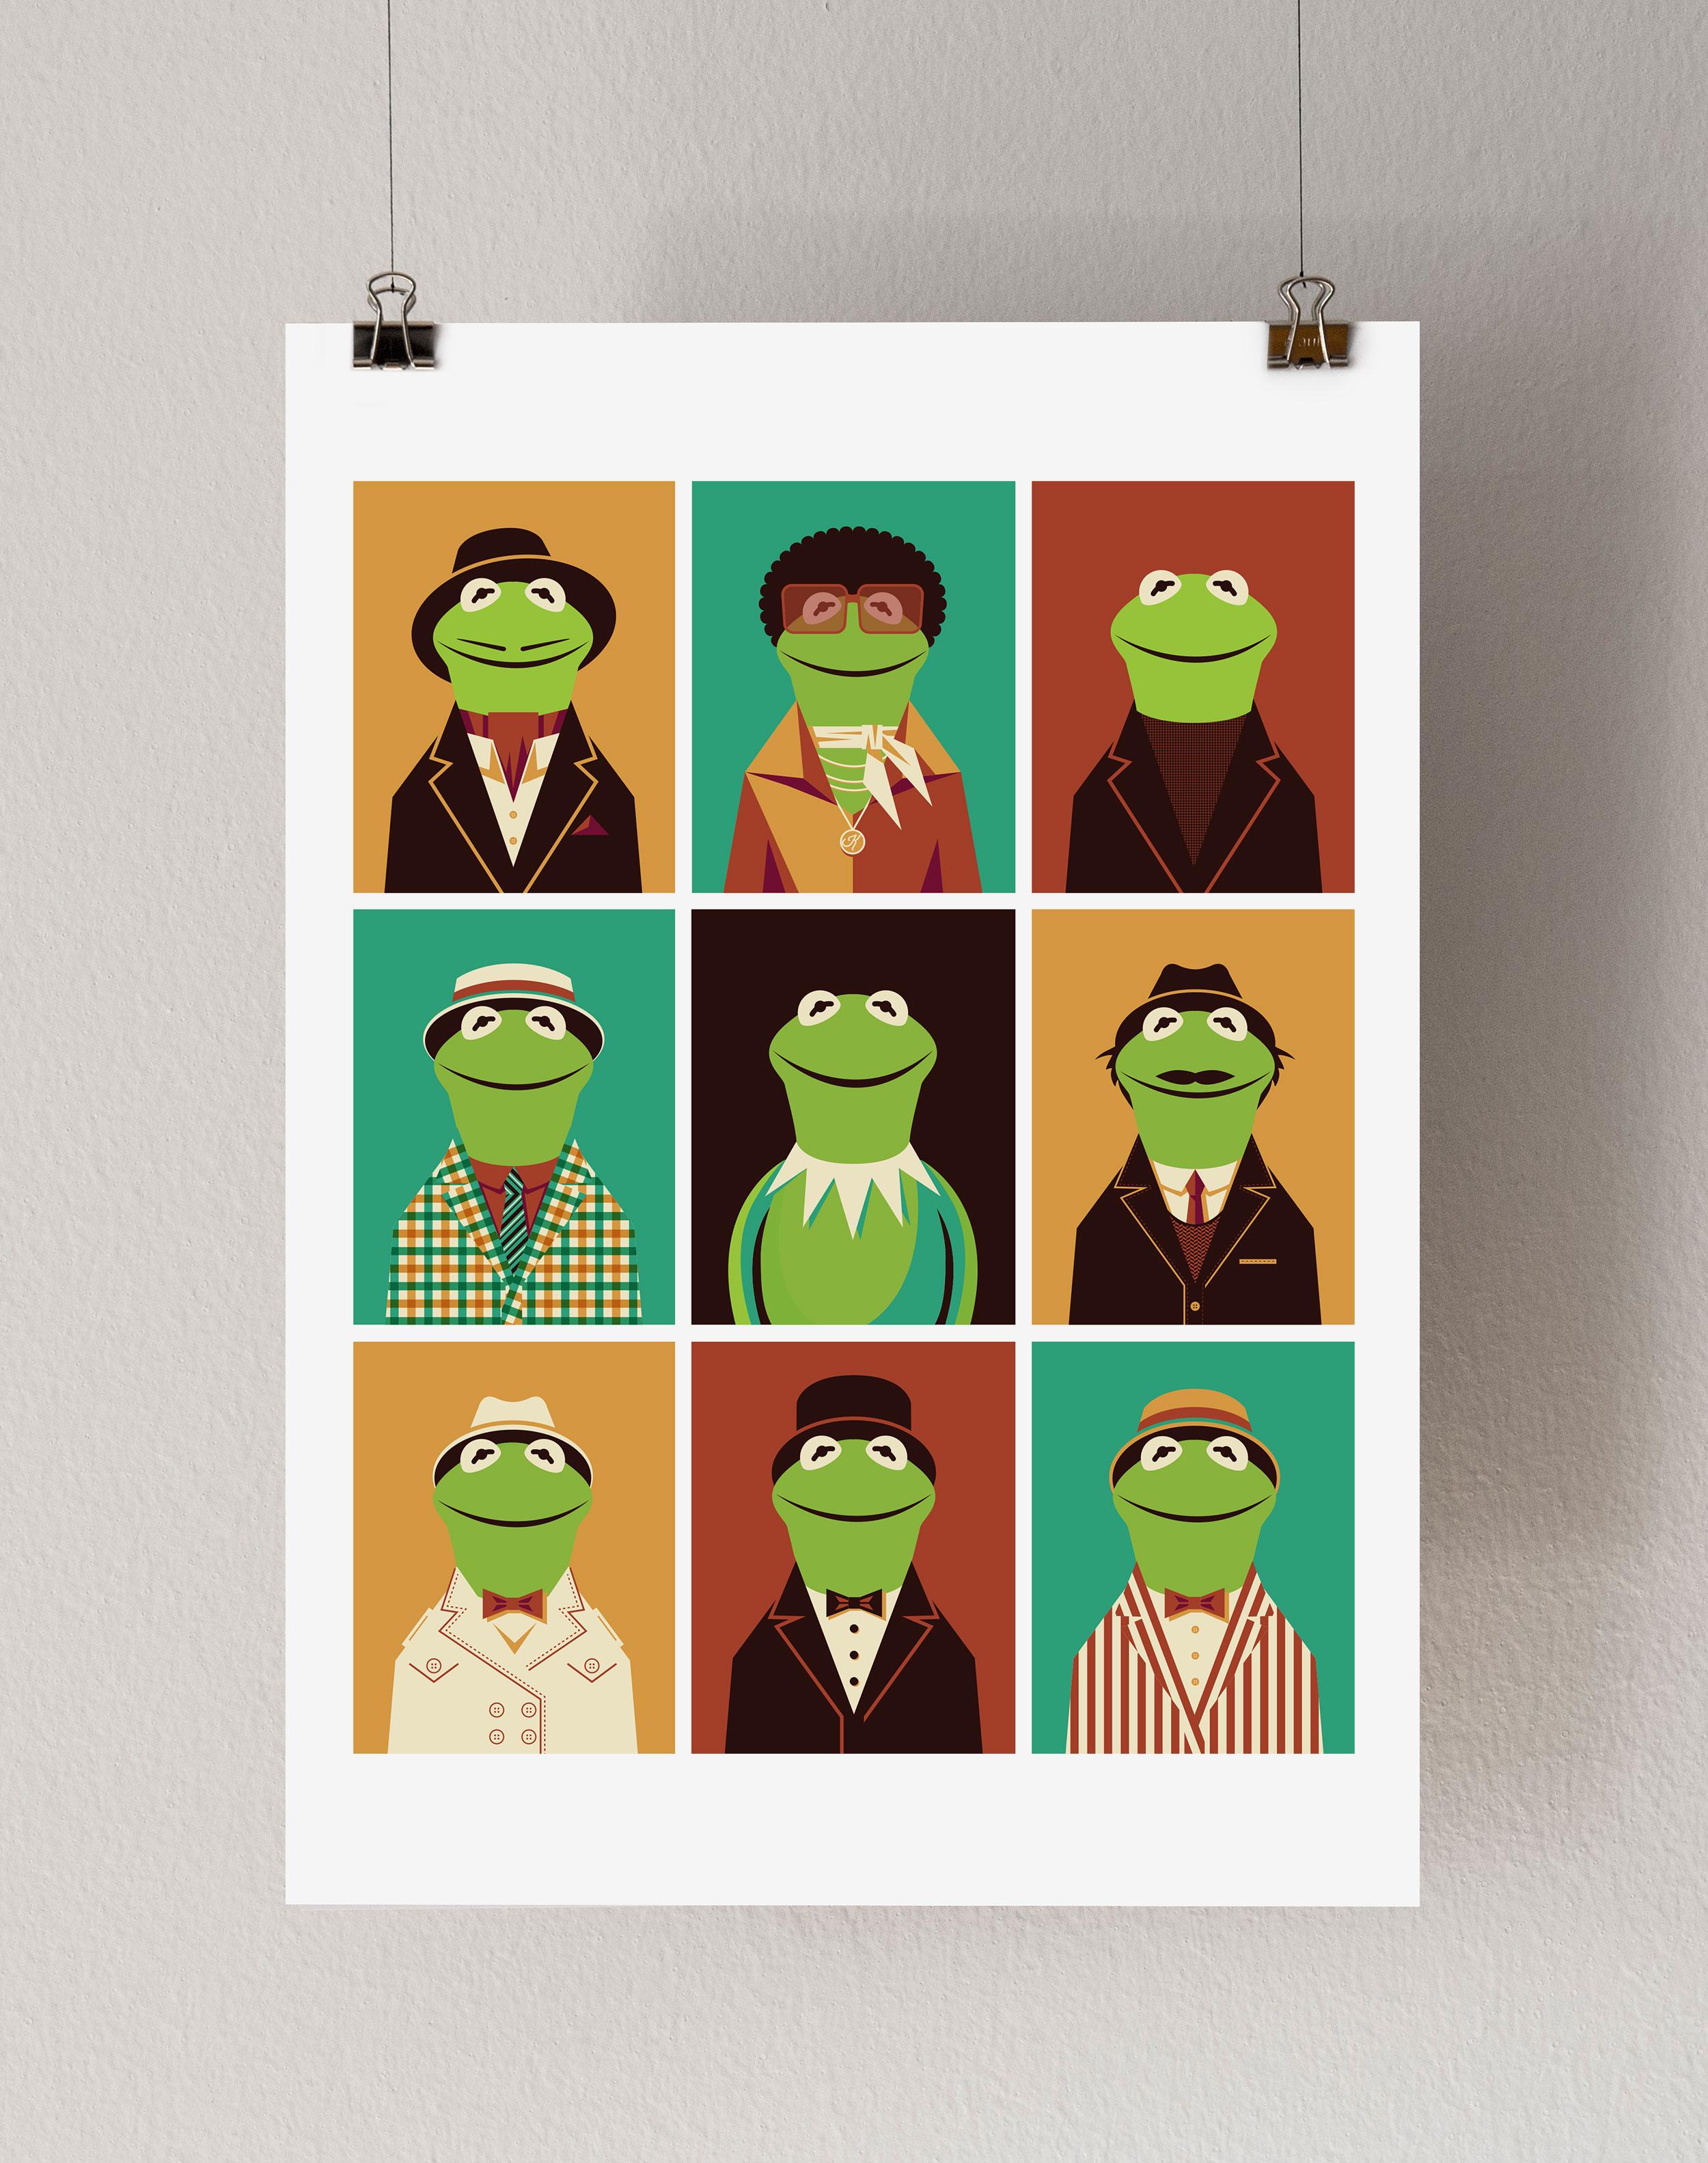 Illustrations_Posters_mockup_kermits.jpg